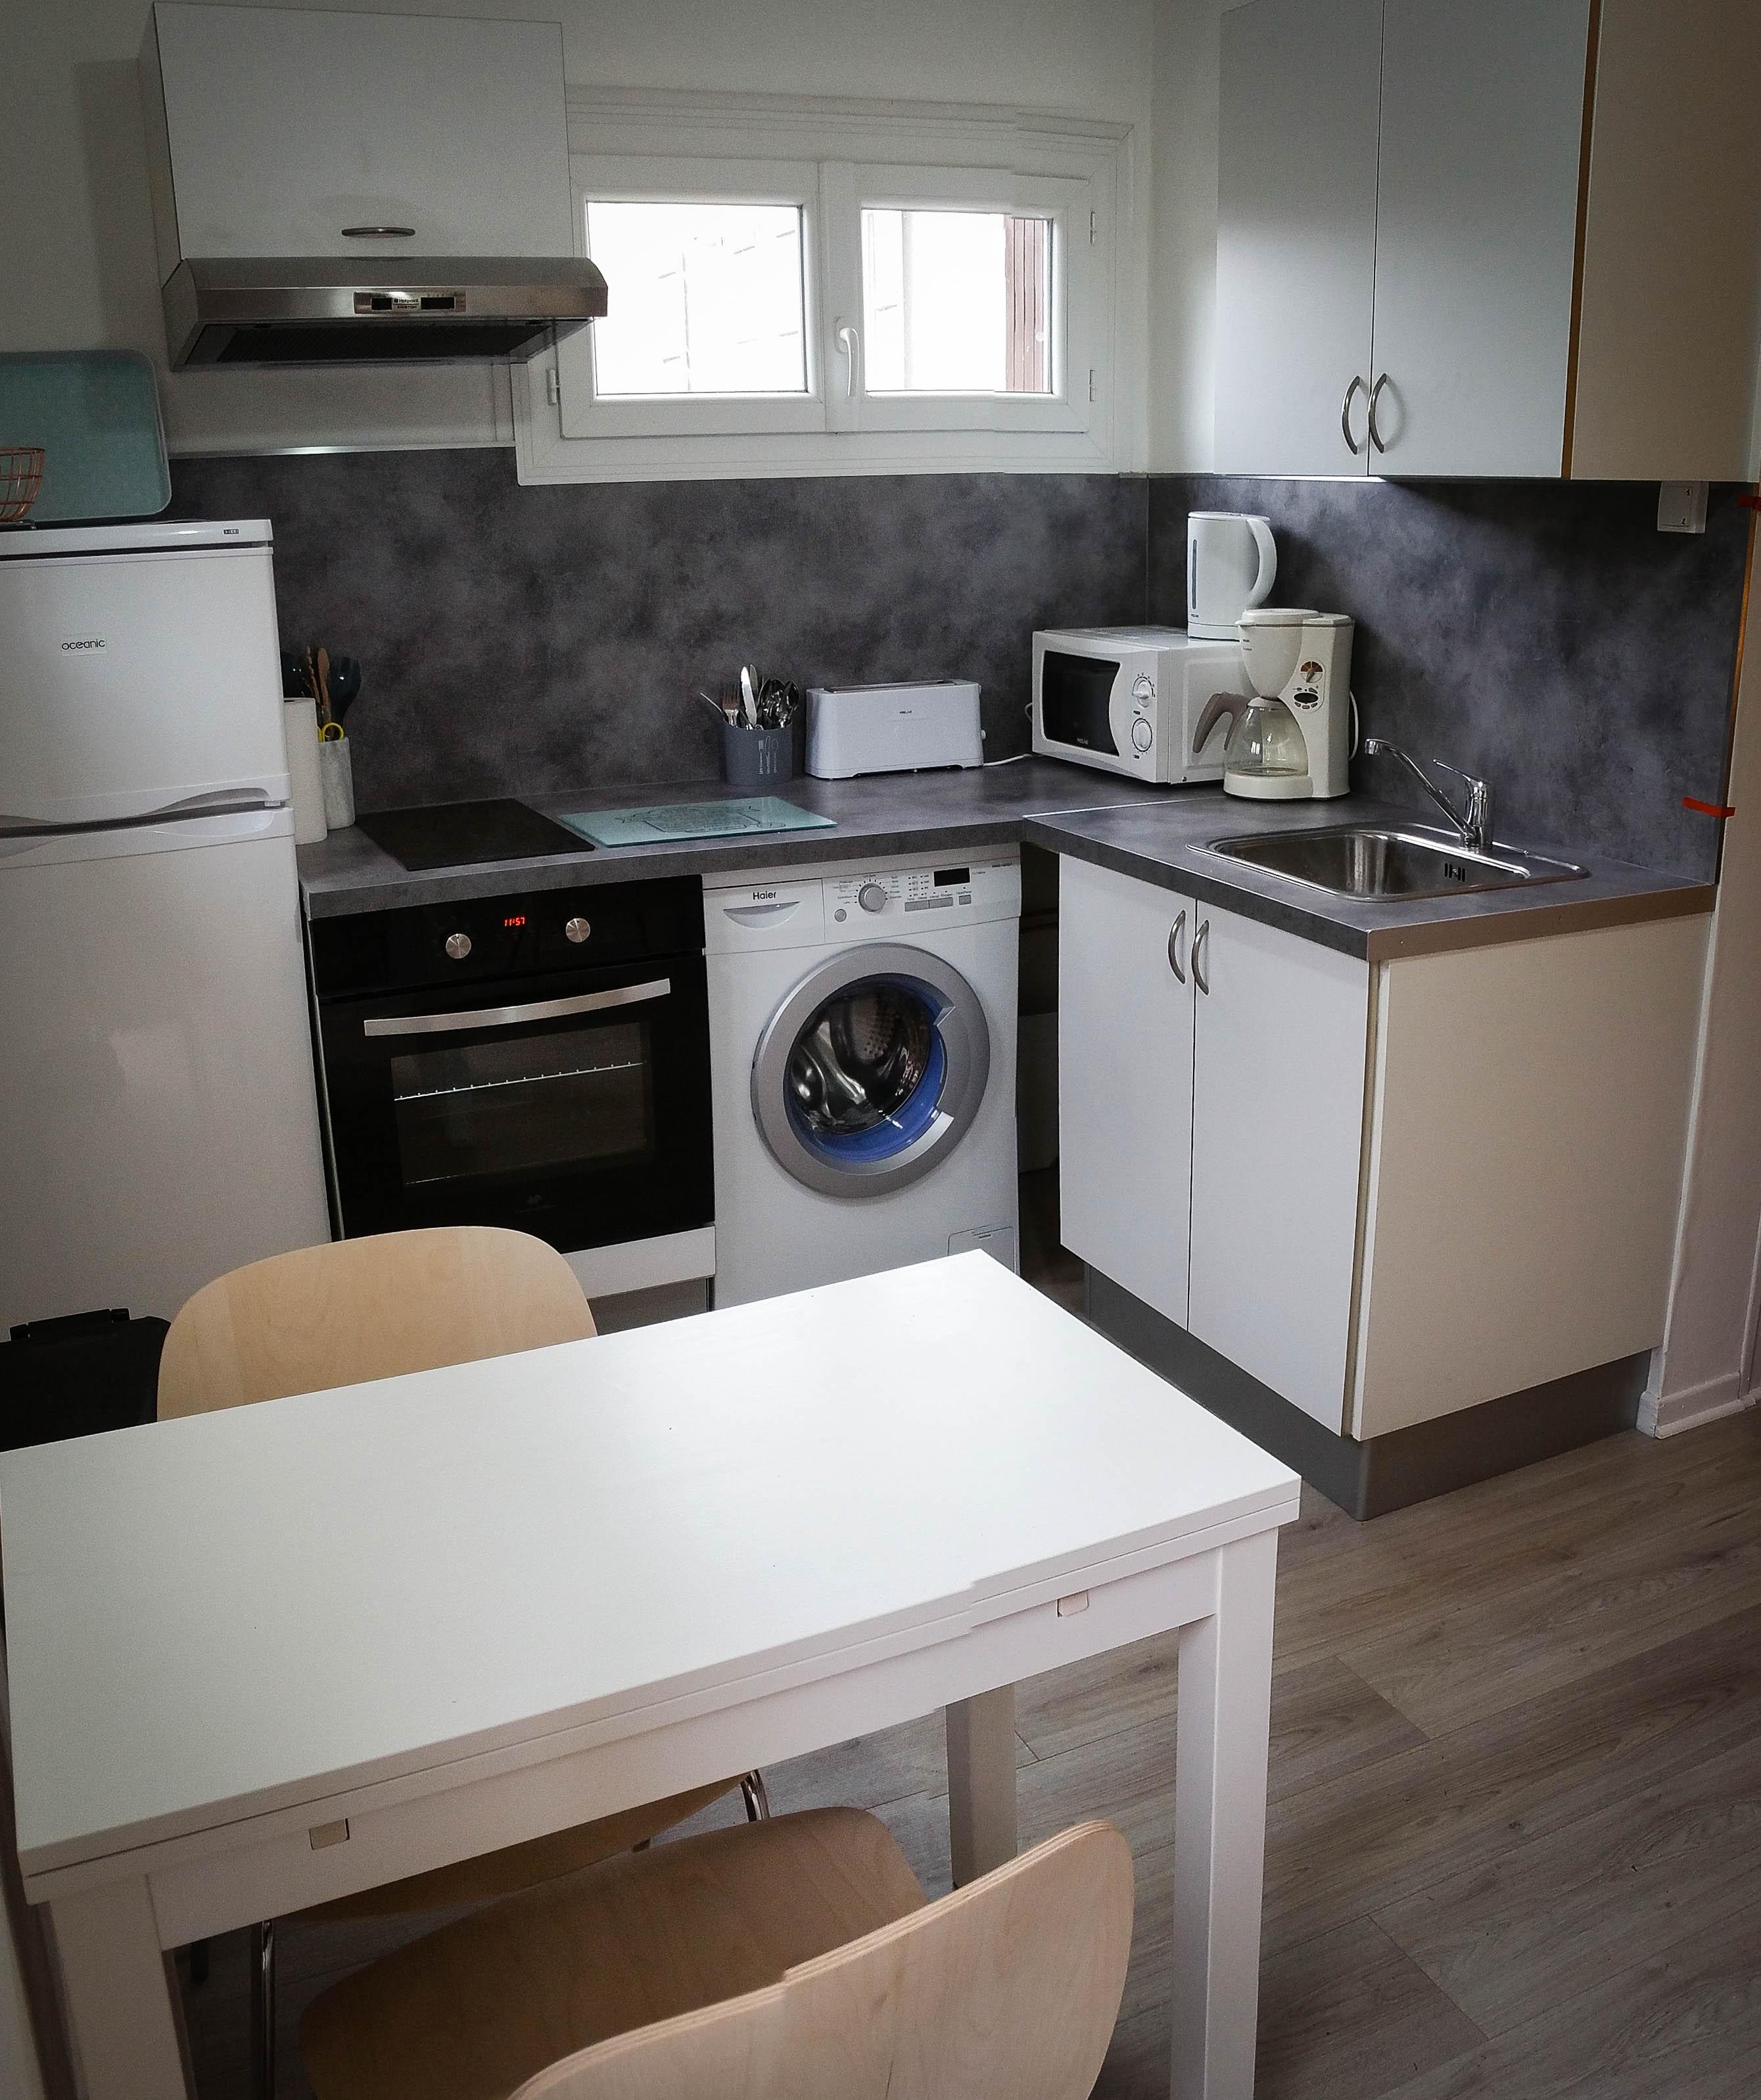 cuisine quip e location studio eug nie les bains locations eug nie les bains. Black Bedroom Furniture Sets. Home Design Ideas